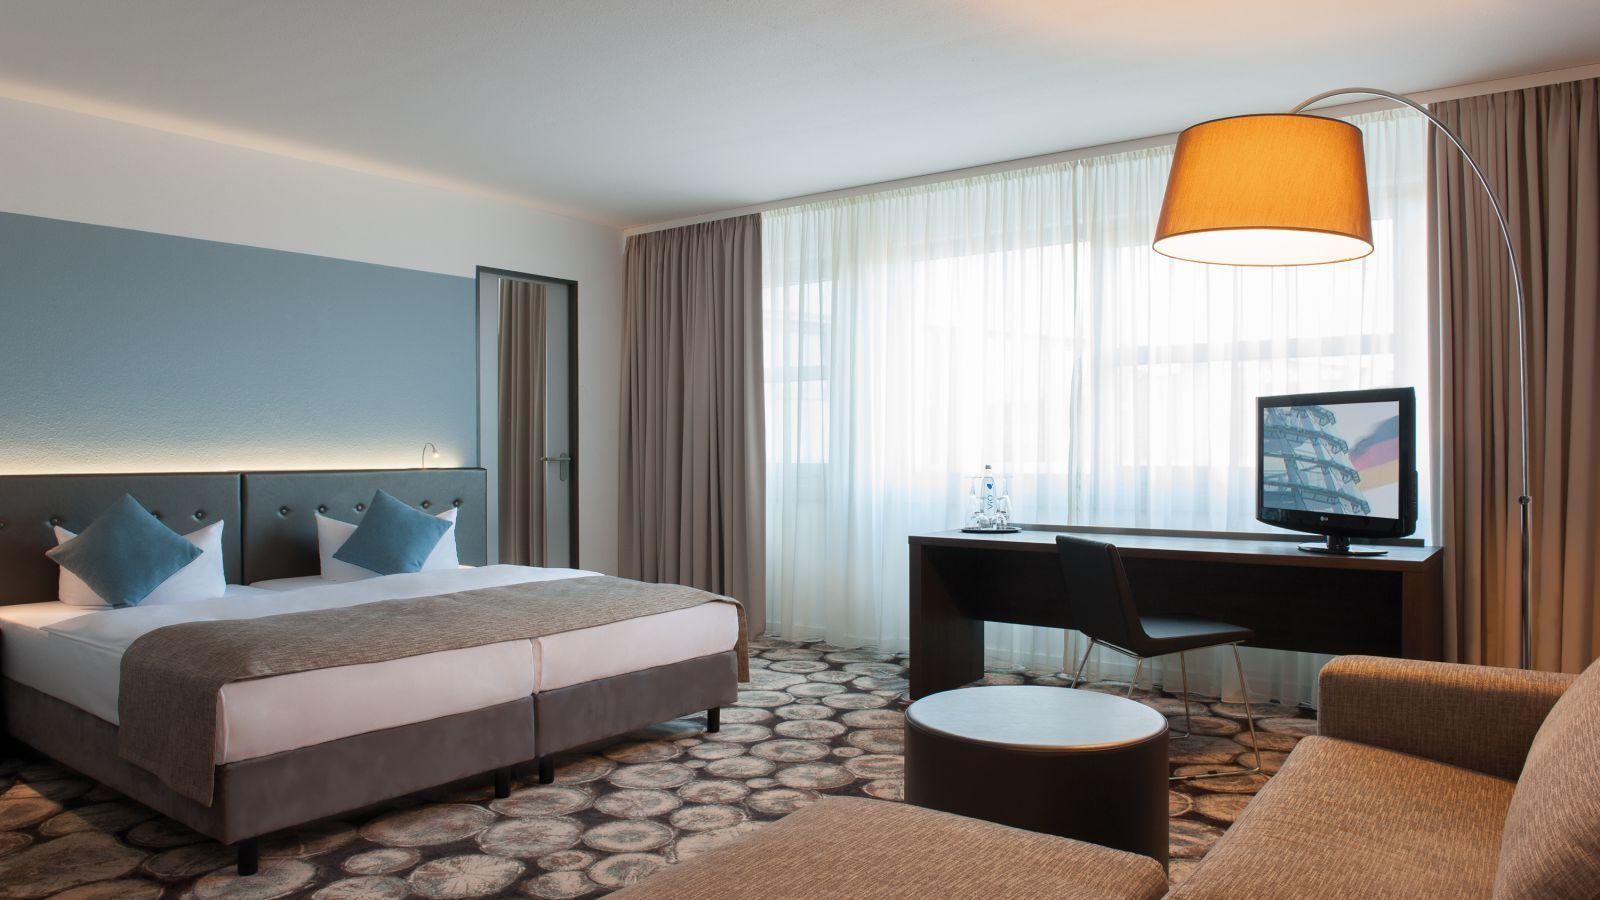 Berlin Tegel Gunstig Ubernachten 3 Sterne Superior Hotel Deluxe Zimmer Deluxezimmer Unsere Renovierten Deluxe Zim Gunstig Ubernachten Design Und Modernes Design